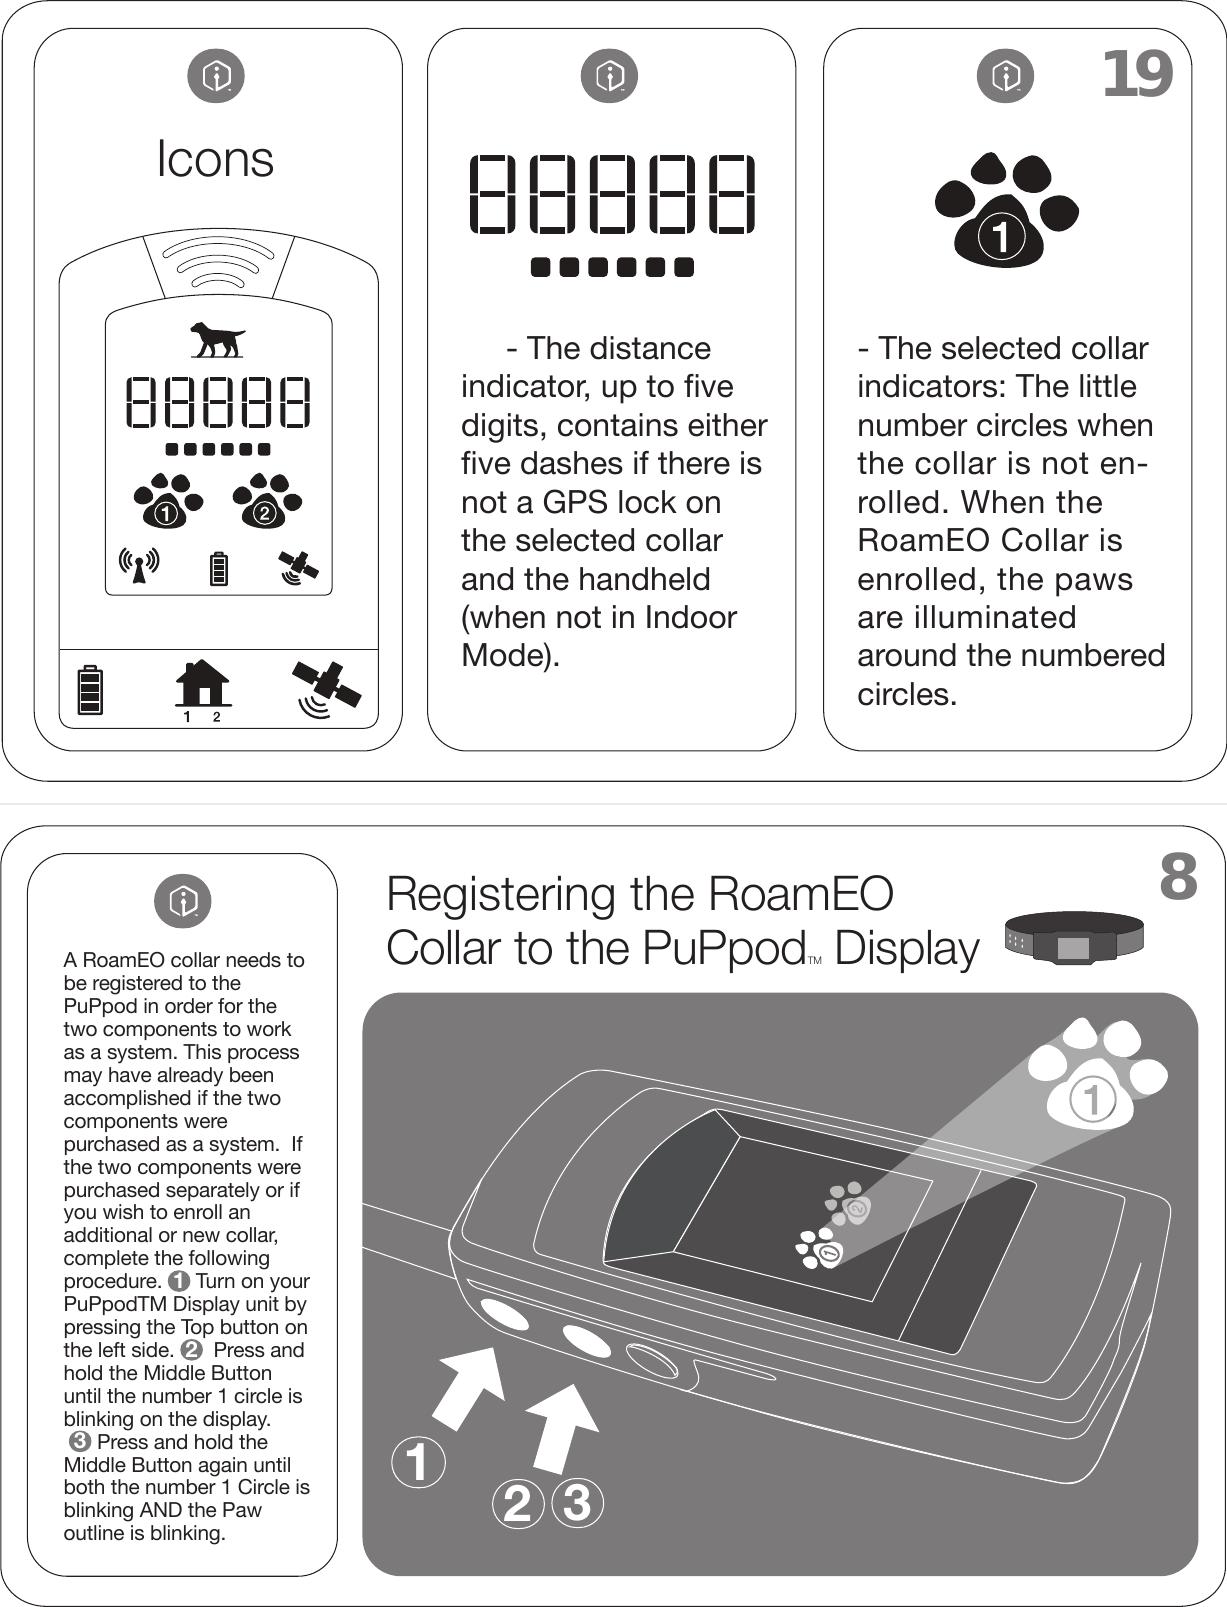 white bear technologies rpupv1 roameo puppod gps pet location system rh usermanual wiki Owner's Manual Instruction Manual Example